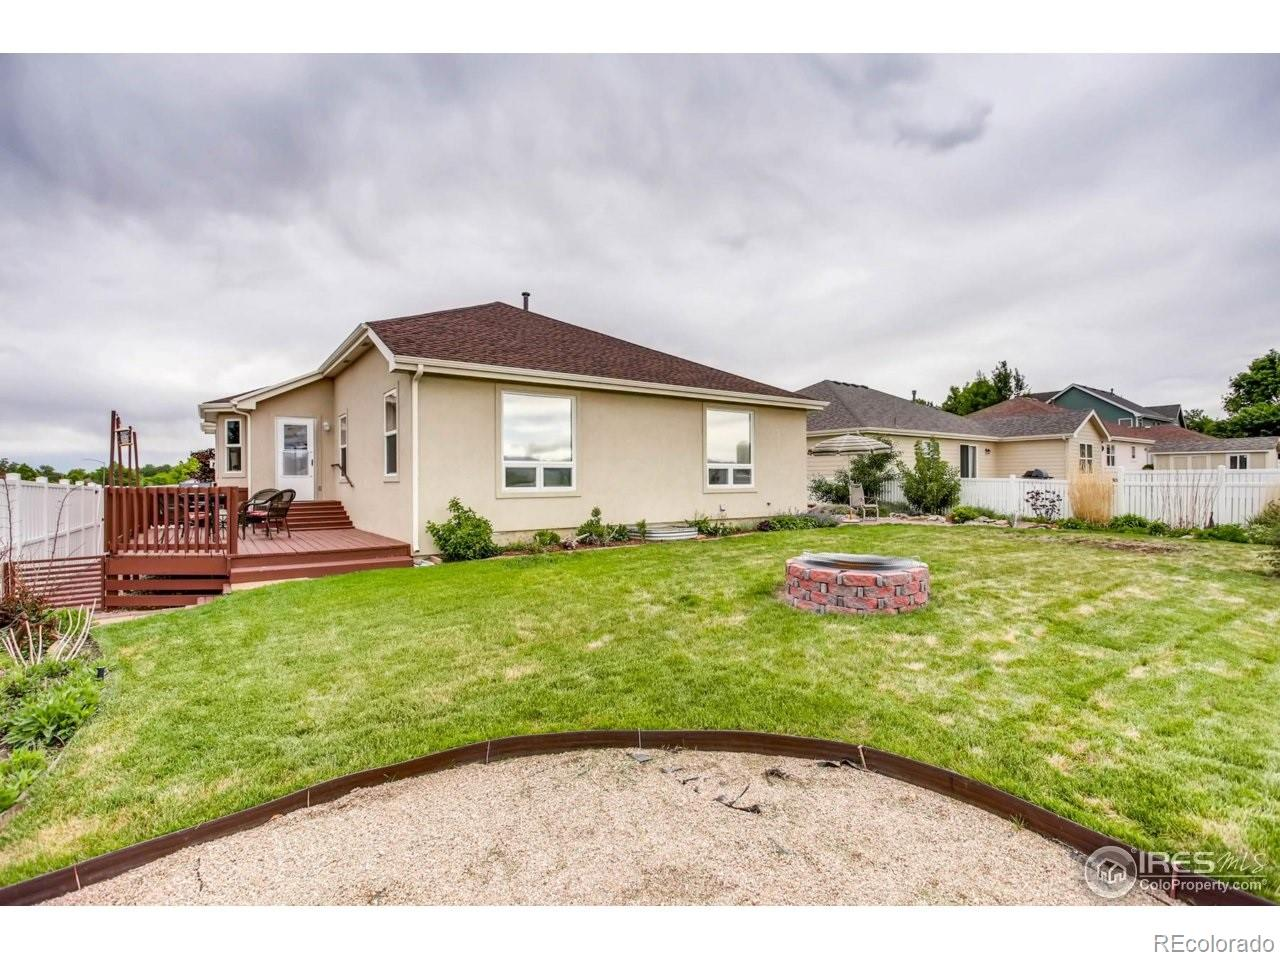 MLS# 1512509 - 31 - 87 Sioux Drive, Berthoud, CO 80513